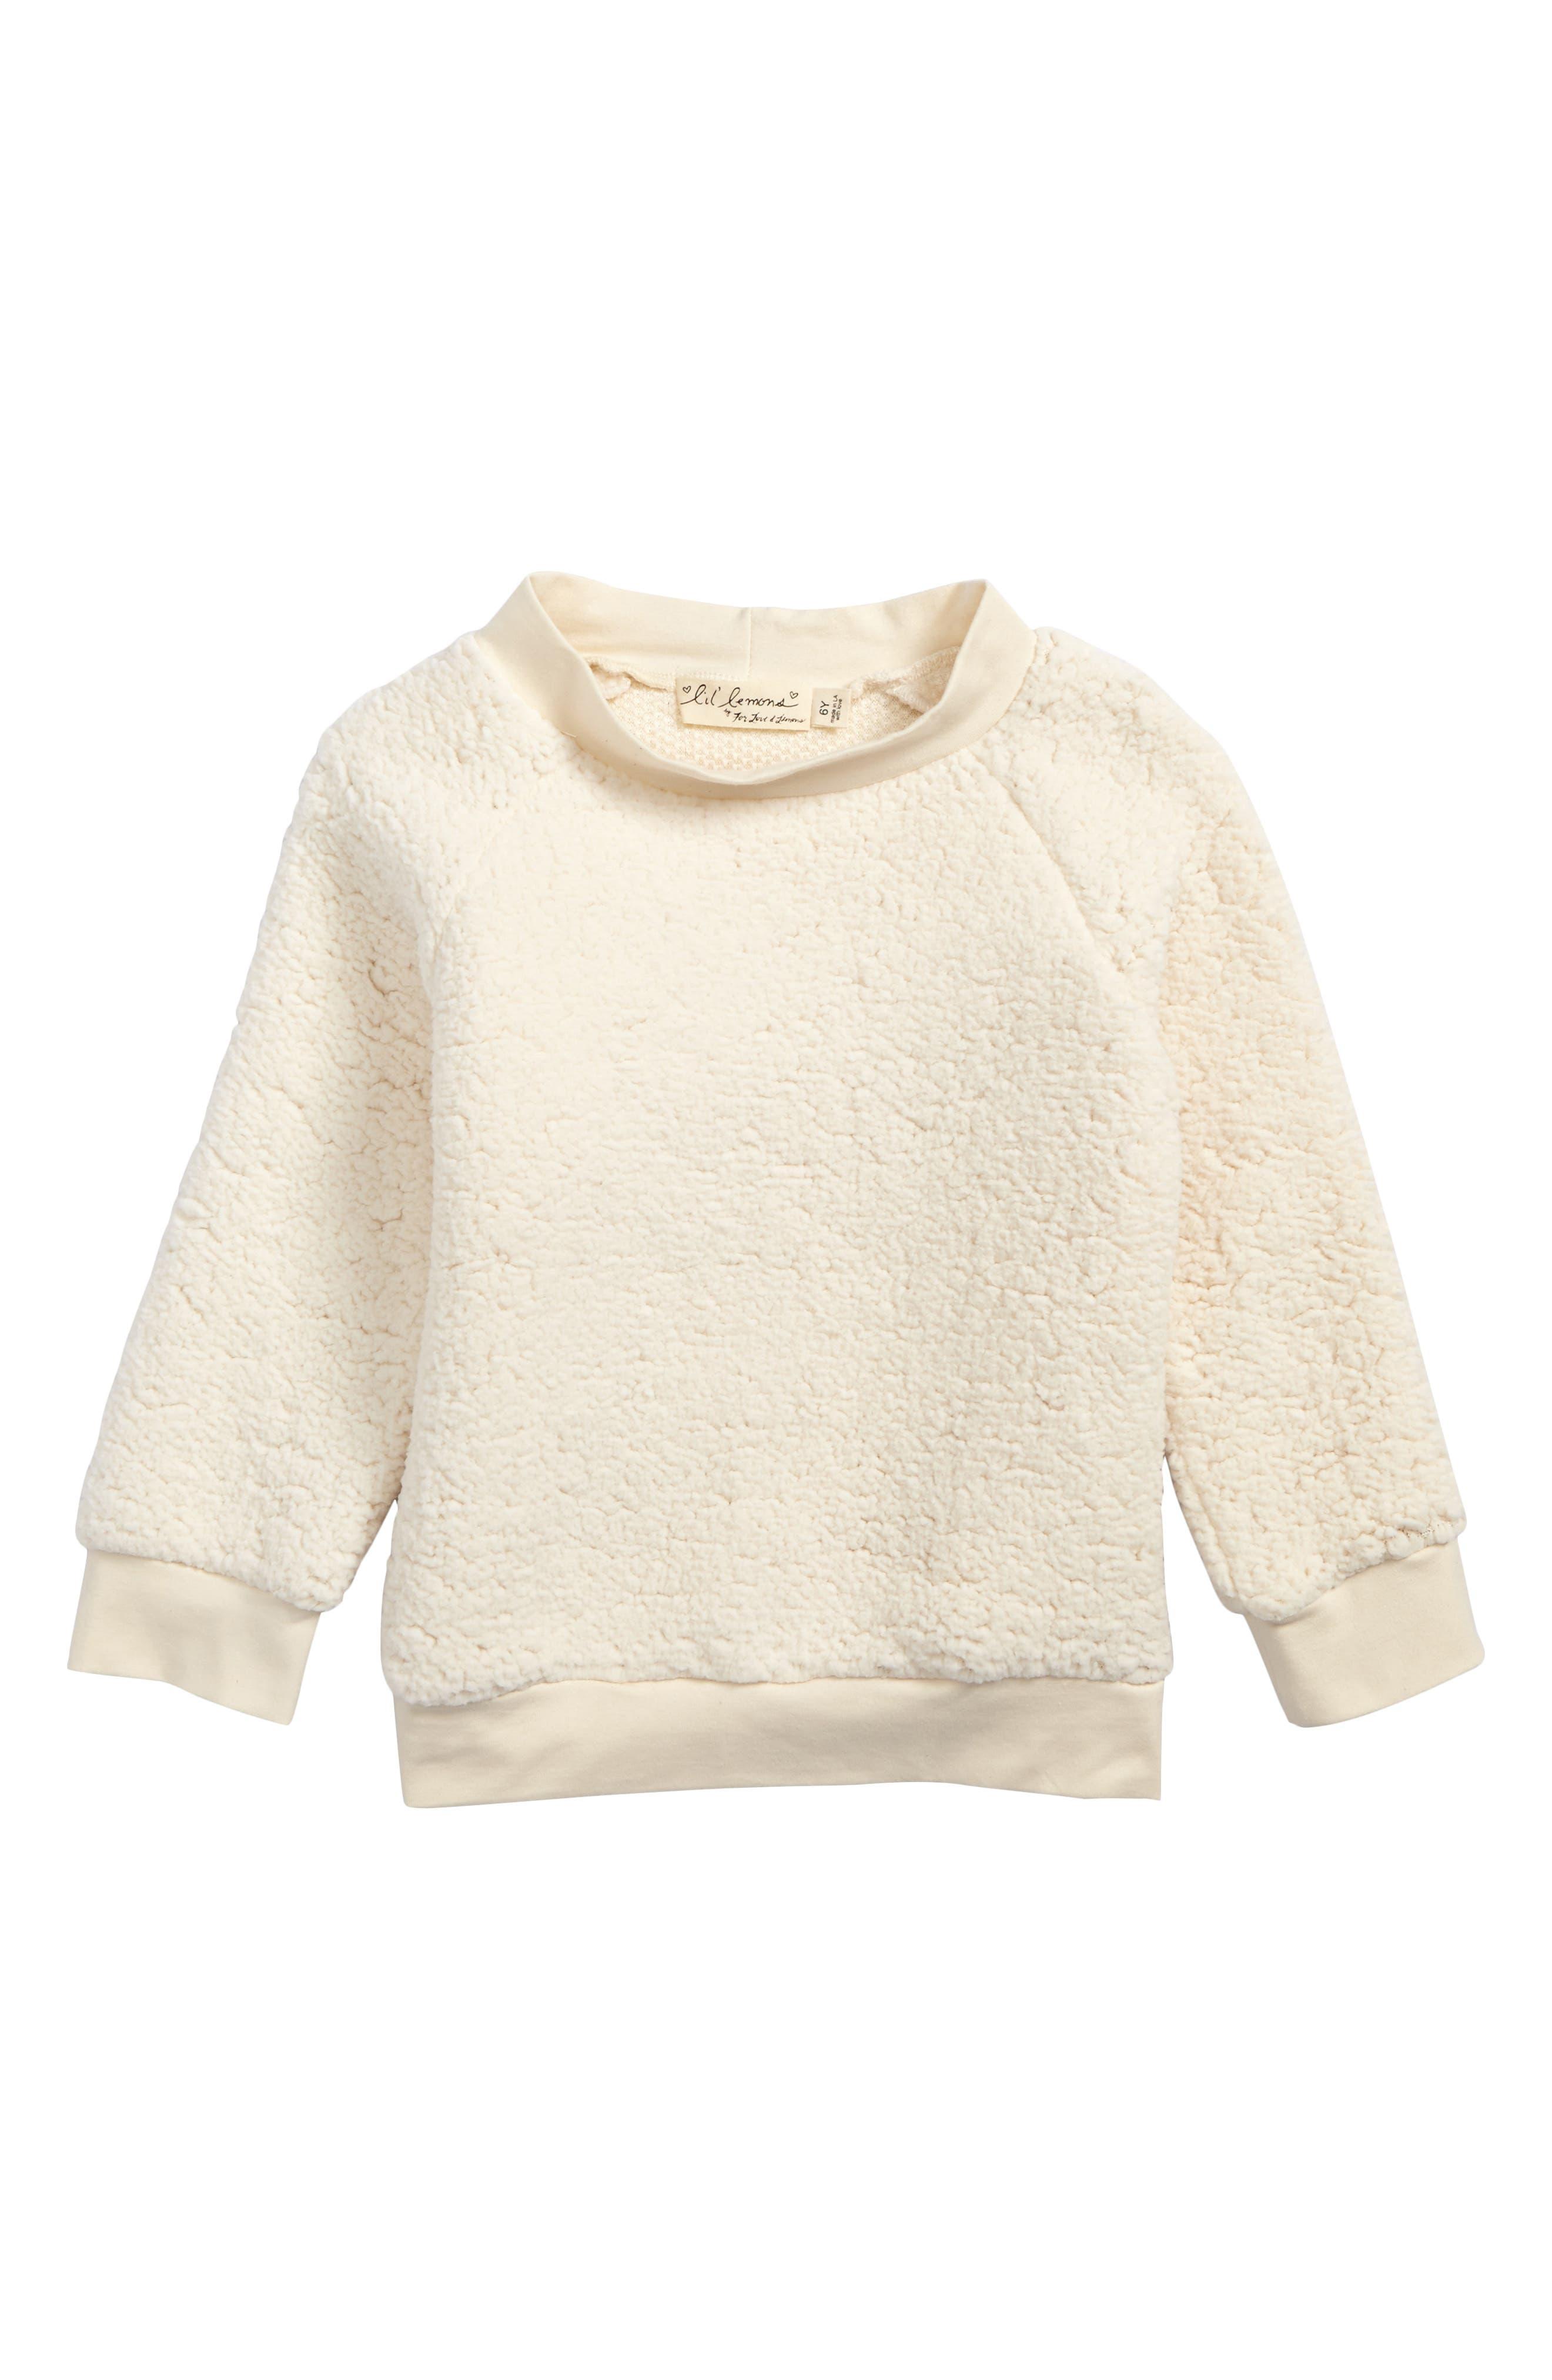 Fuzzy Raglan Sweatshirt,                             Main thumbnail 1, color,                             900